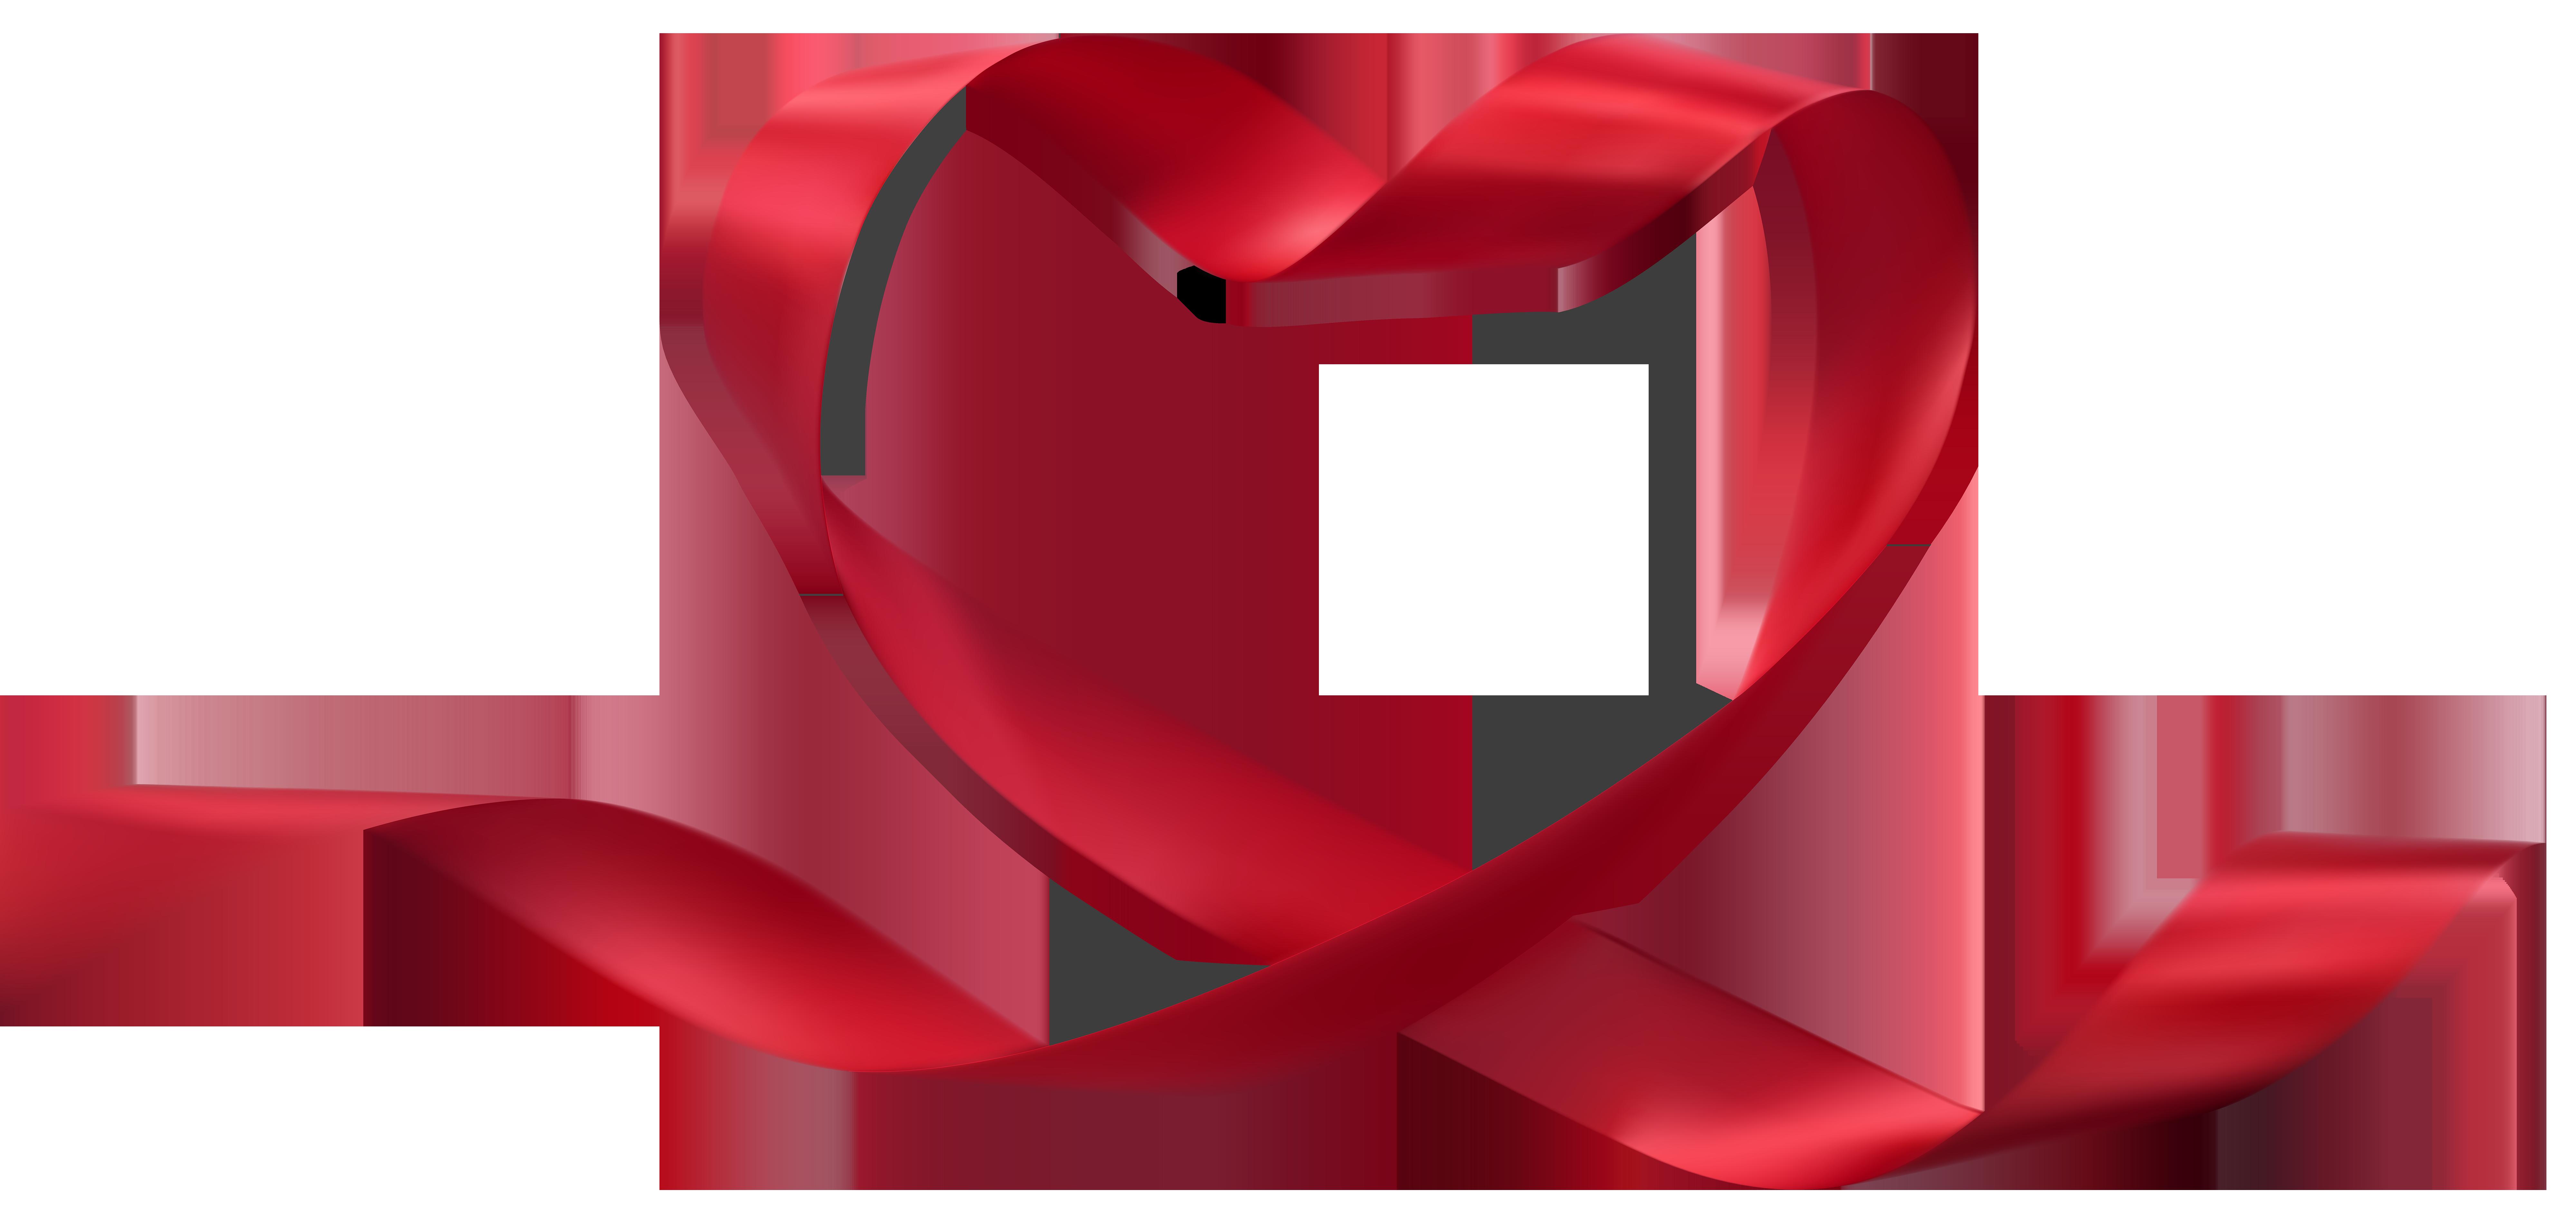 8000x3757 Heart Ribbon Transparent Png Clip Art Imageu200b Gallery